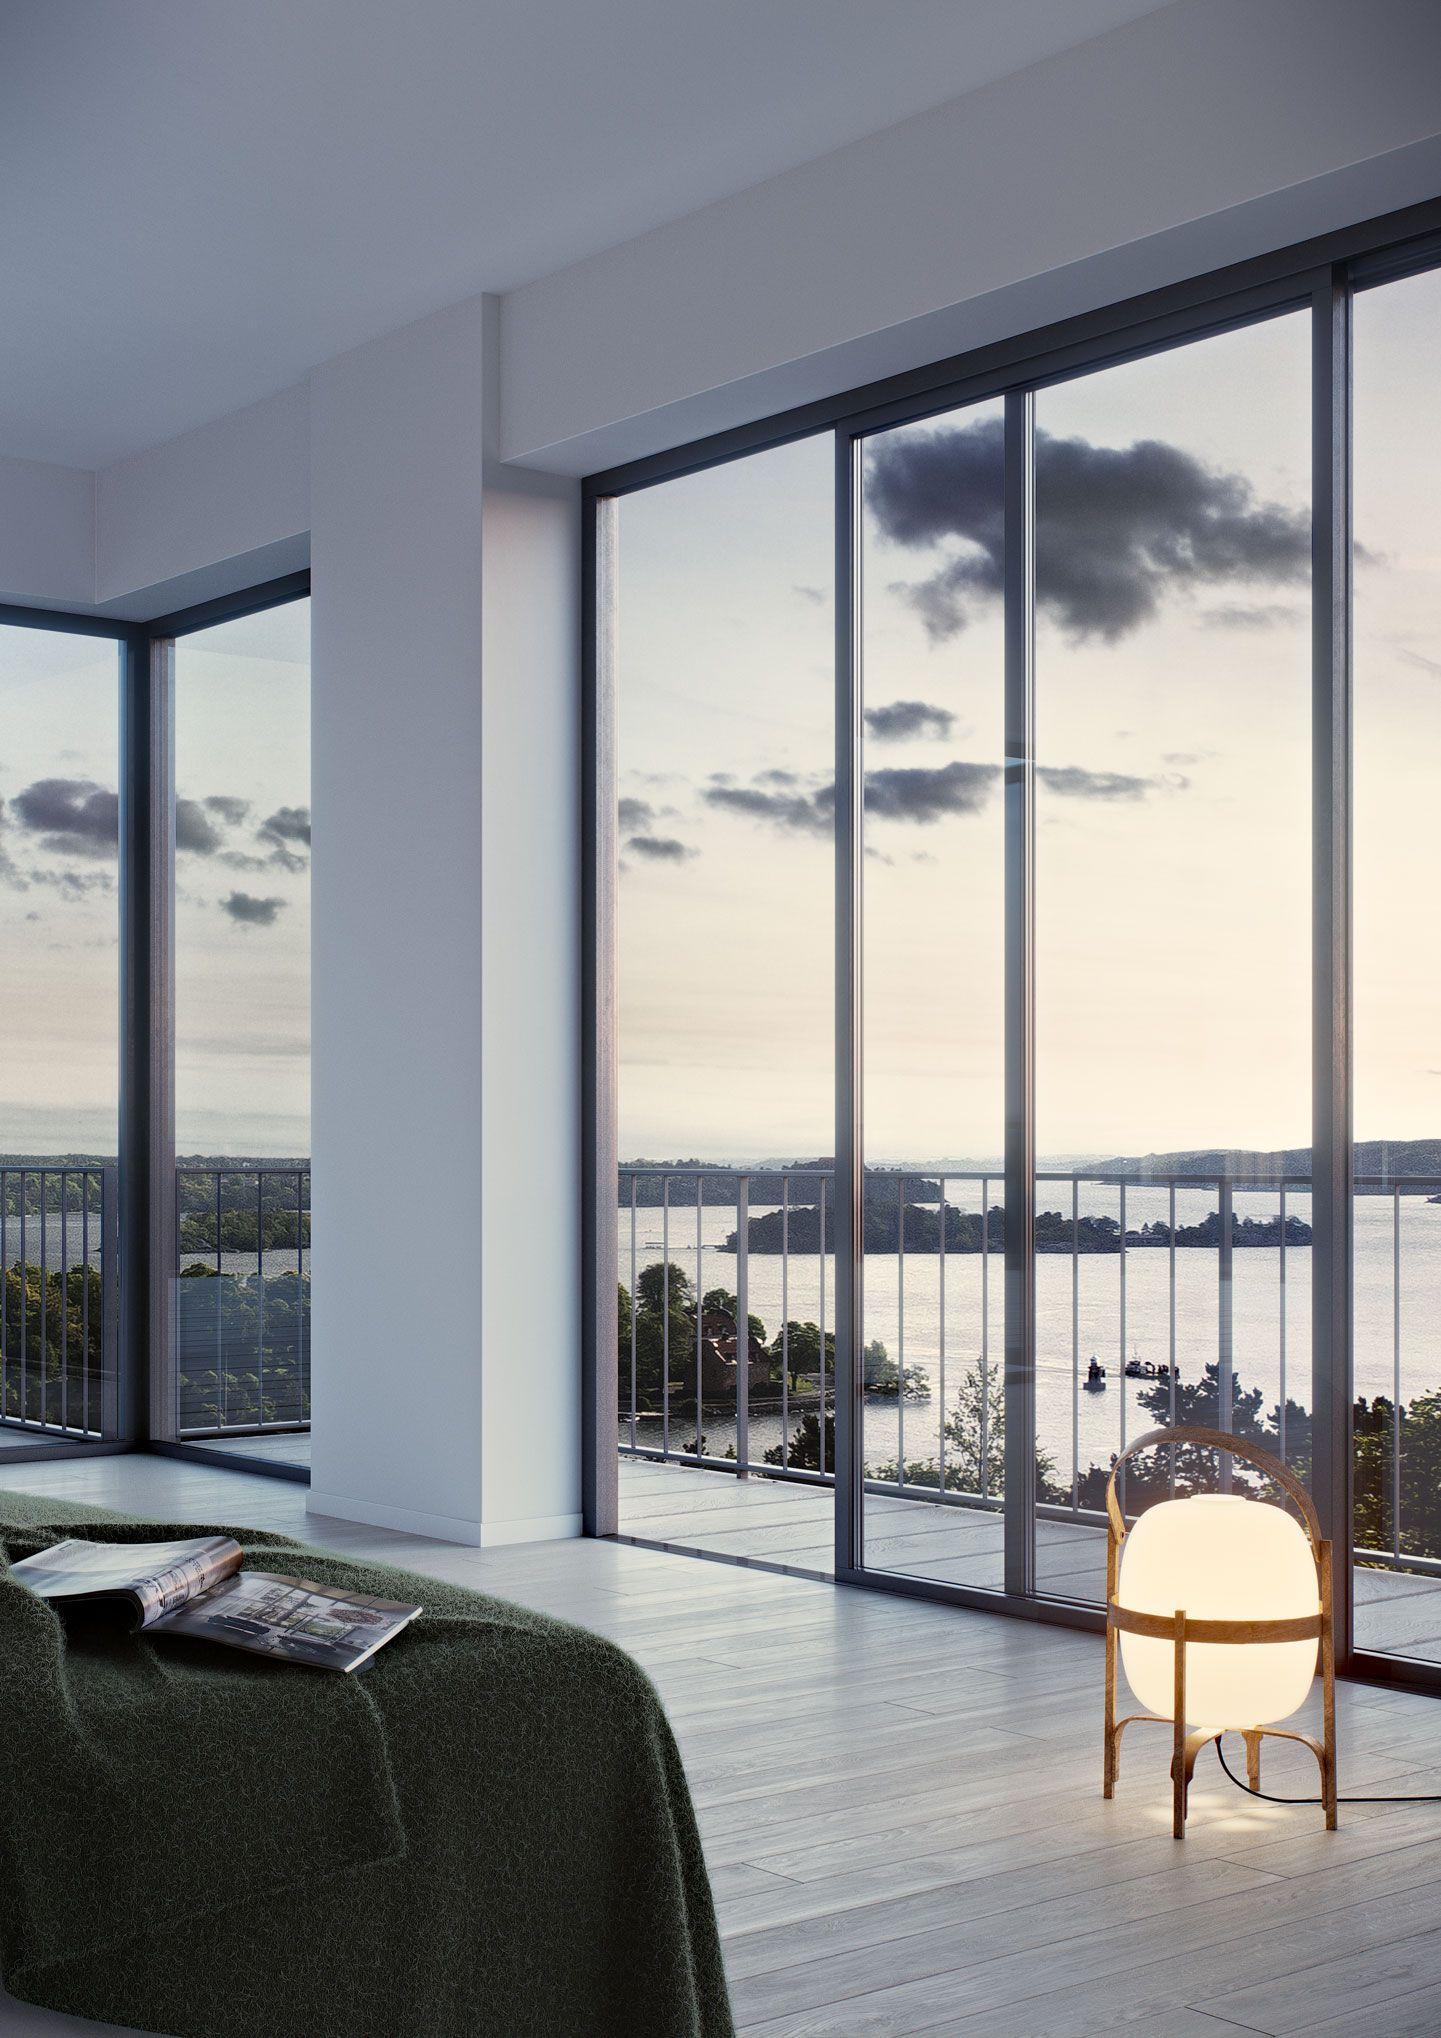 Oscarproperties oscar properties stockholm interior for Window design 2018